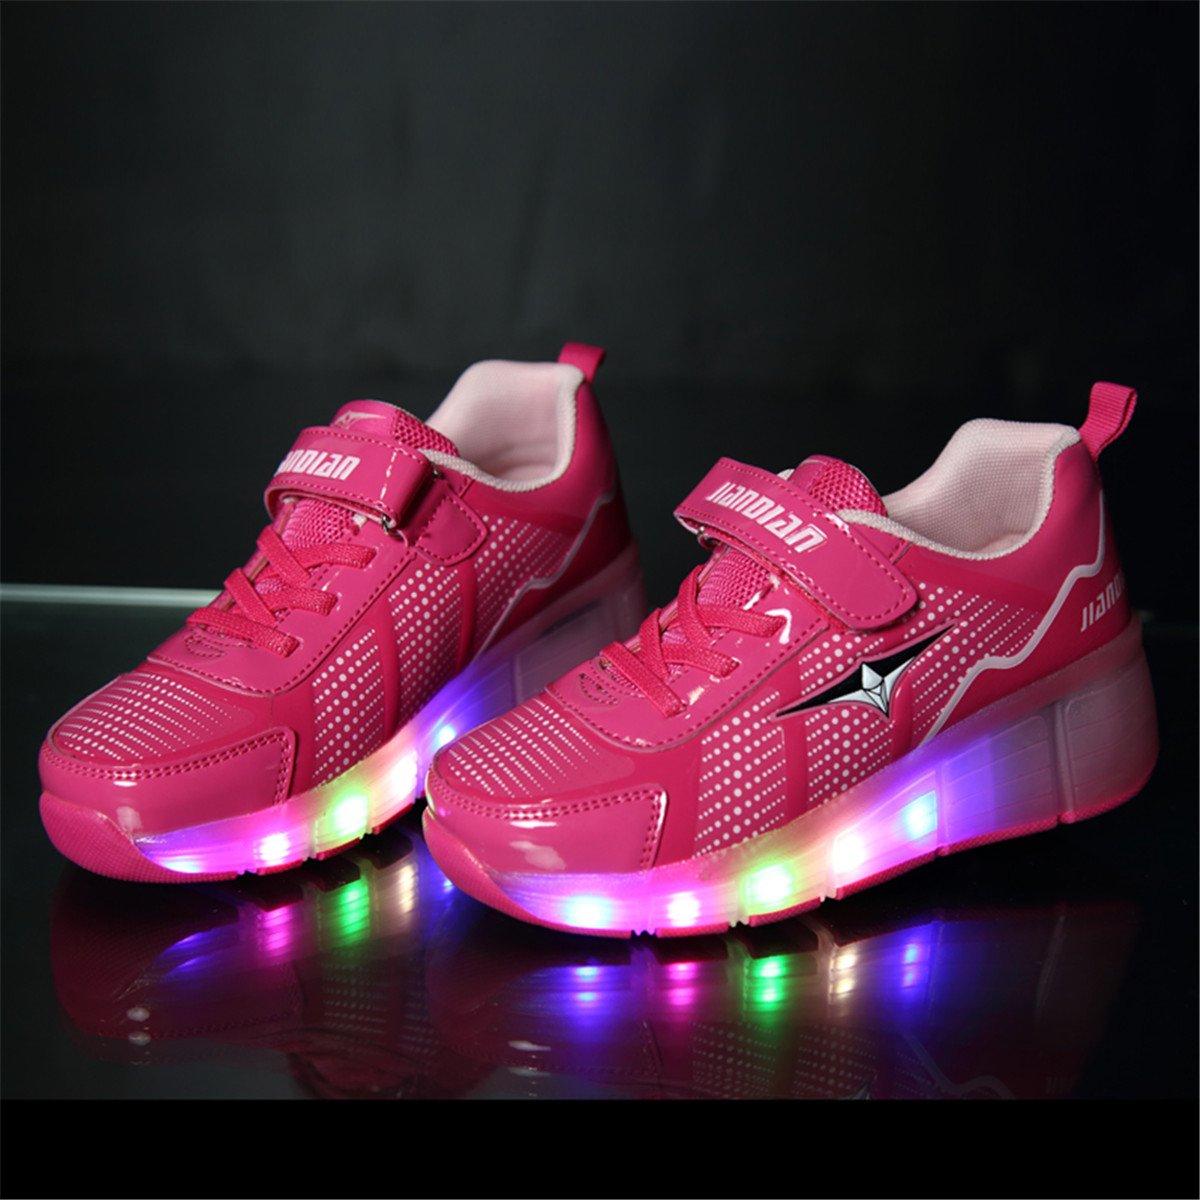 Unisex Enfants LED ChaussuresSingle Roulette,Bouton Poussoir Ajustable,LED Skates Baskets Chaussures,Multisports Outdoor Sneakers